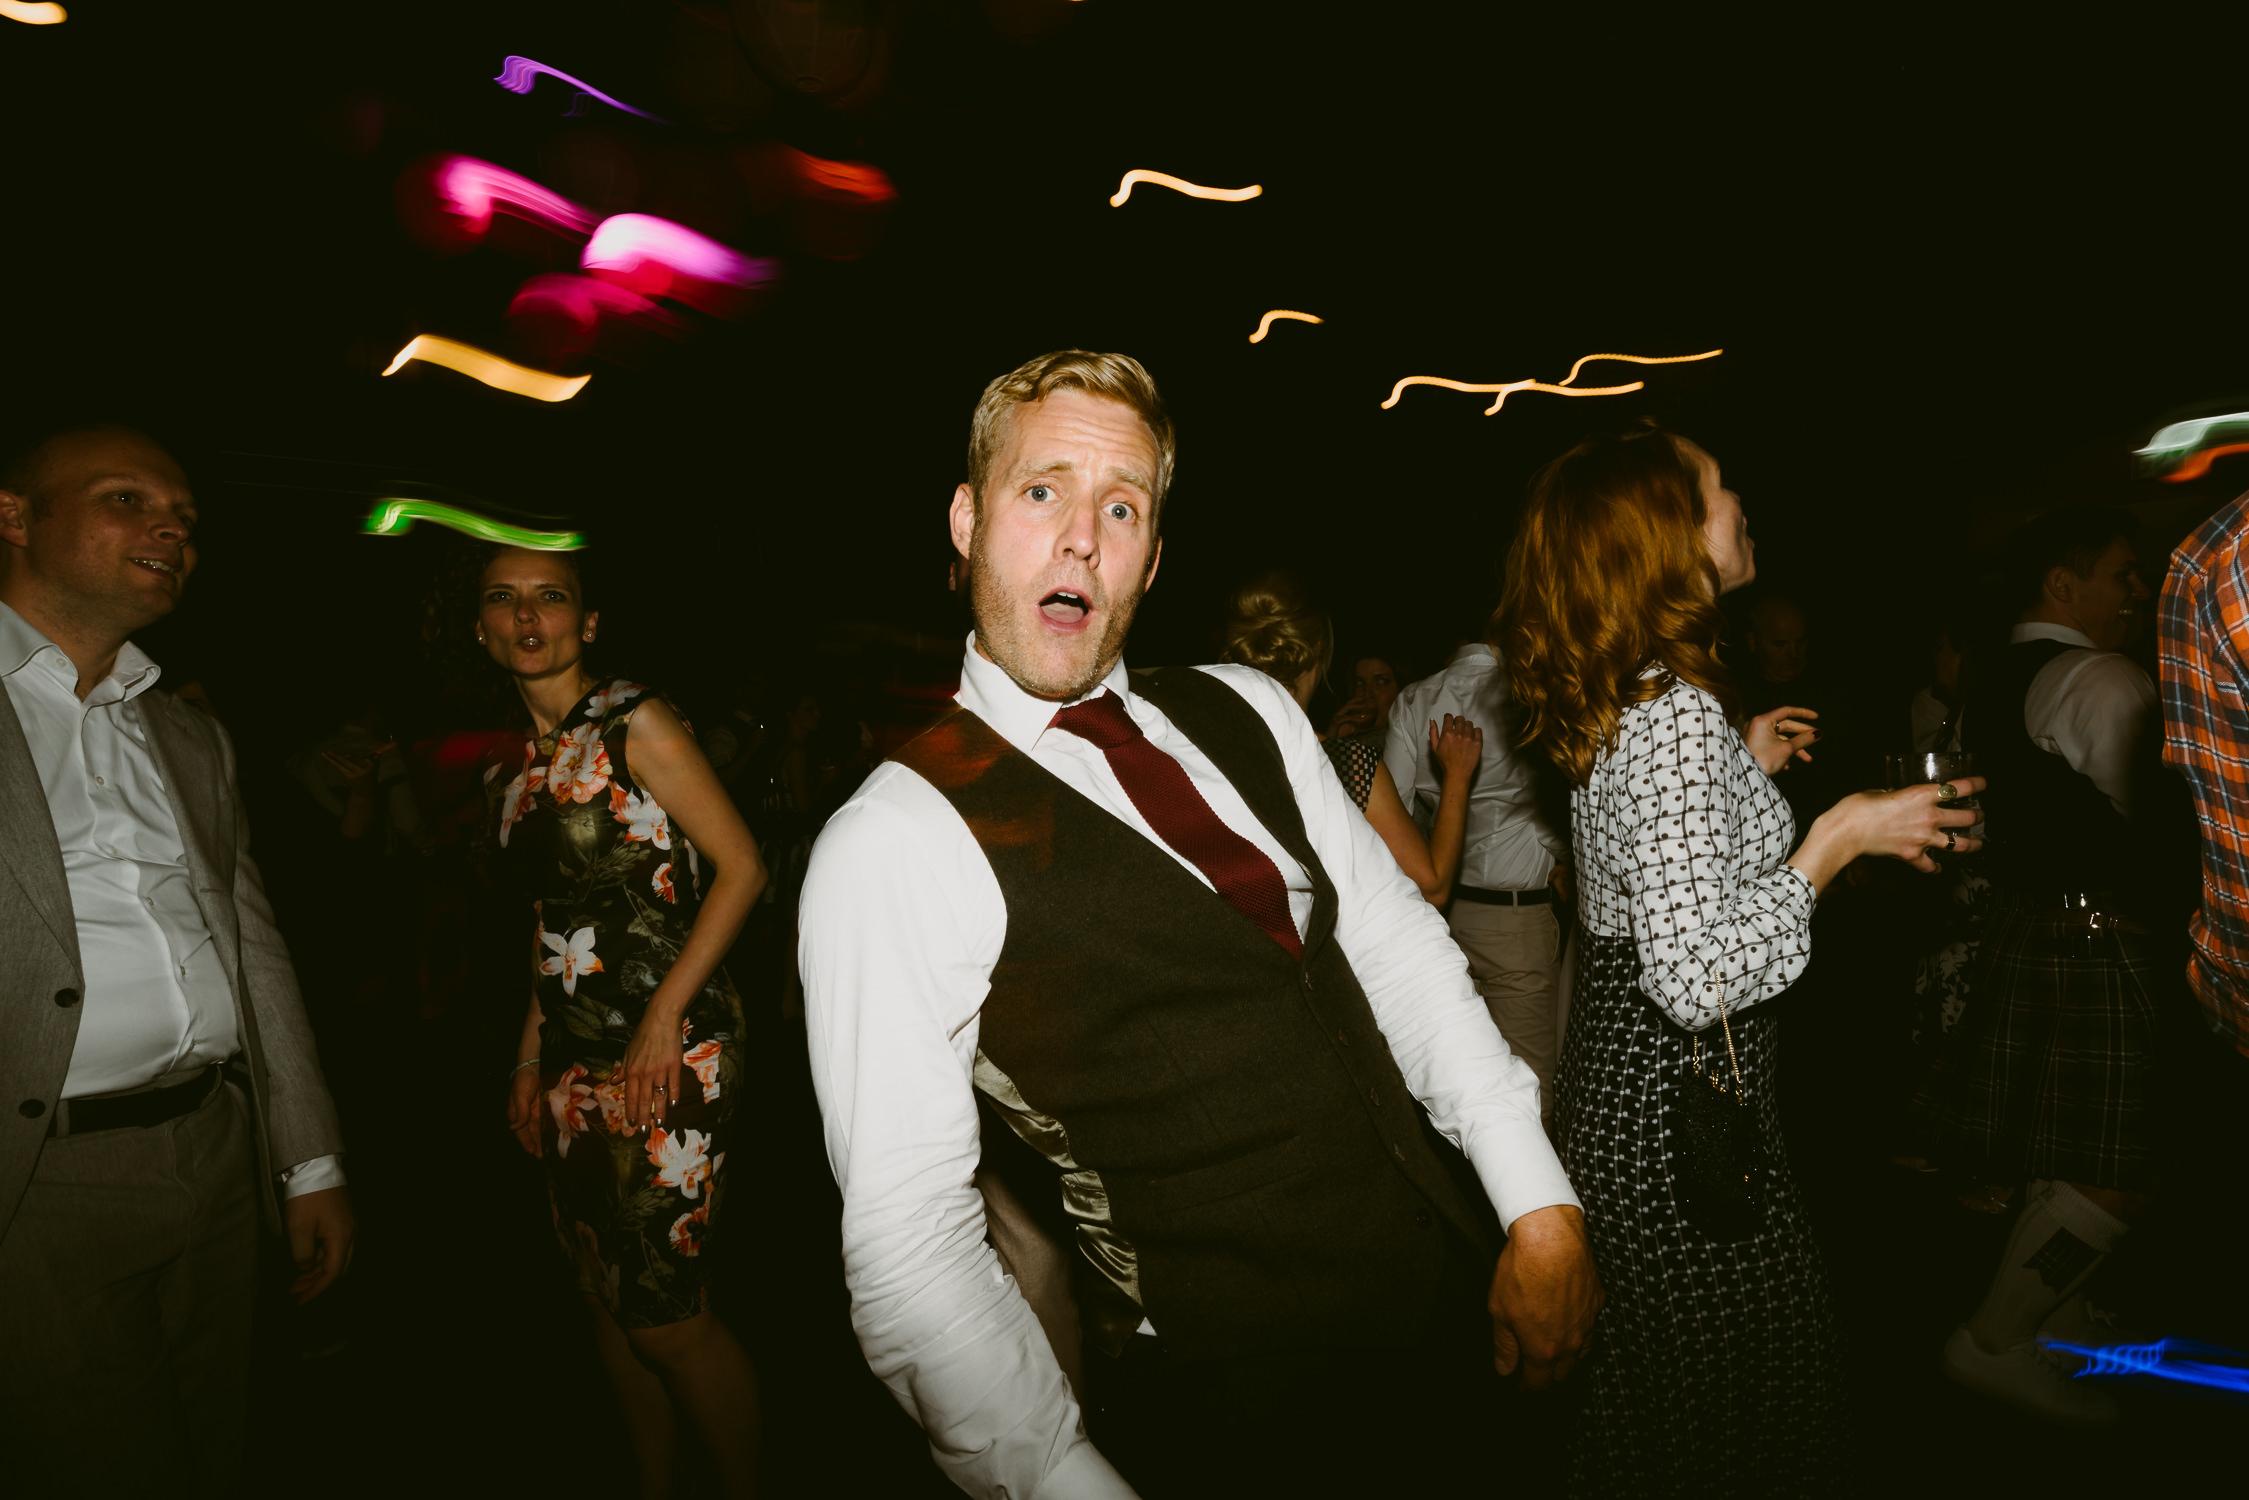 amsterdam-wedding-photographer-trouwfotograaf-bruidsfotograaf-mark-hadden-bruidsfotografie-David & Ronald-420.jpg